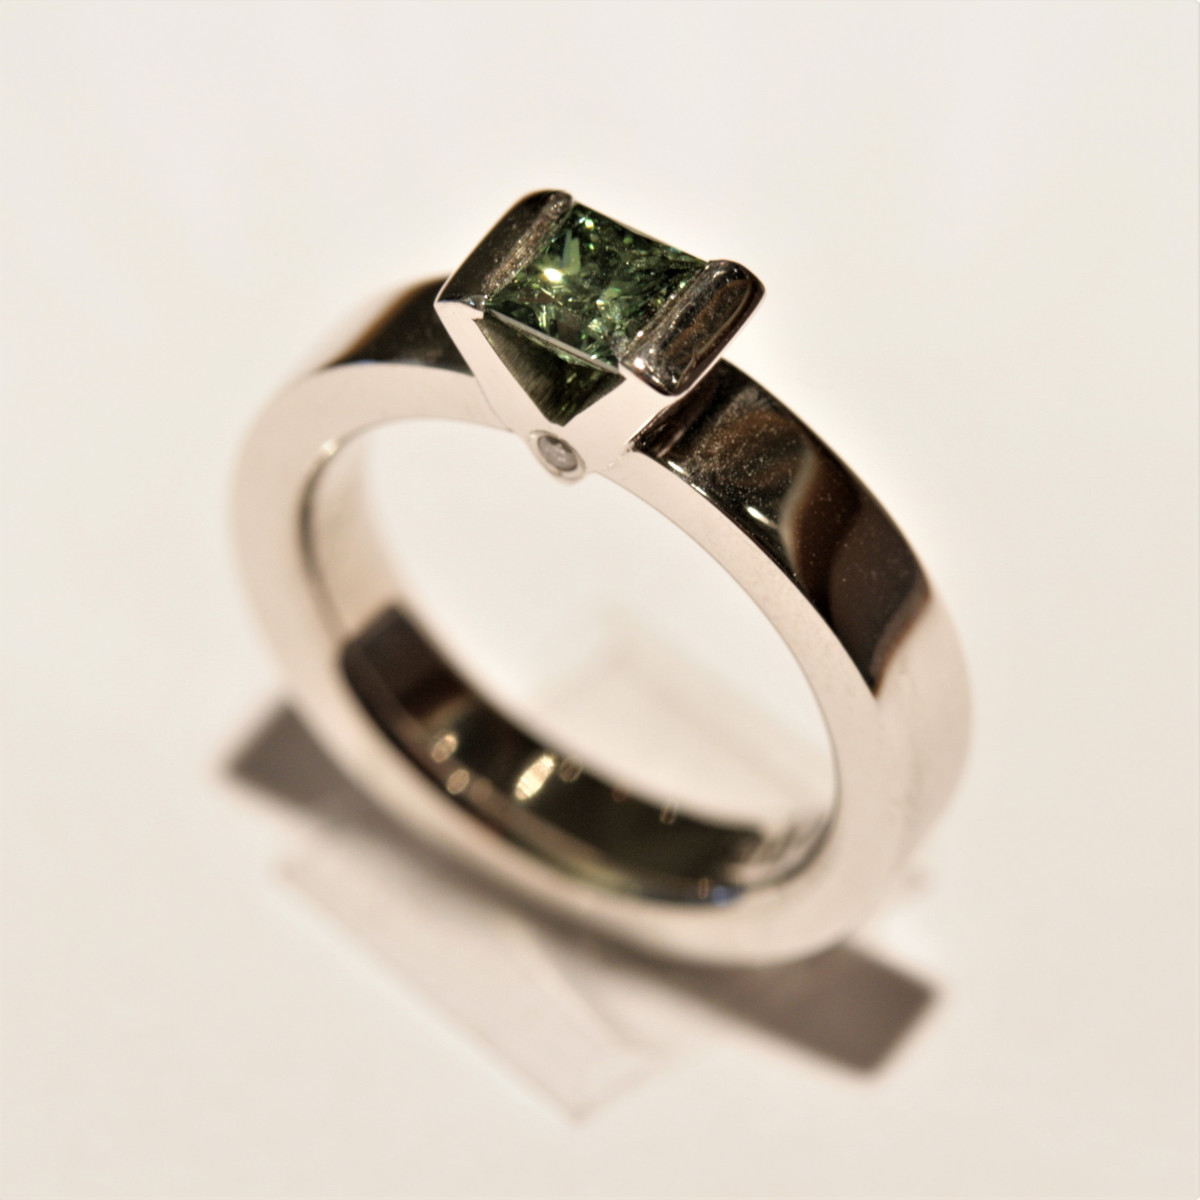 Grön diamant, vigselring, diamantring